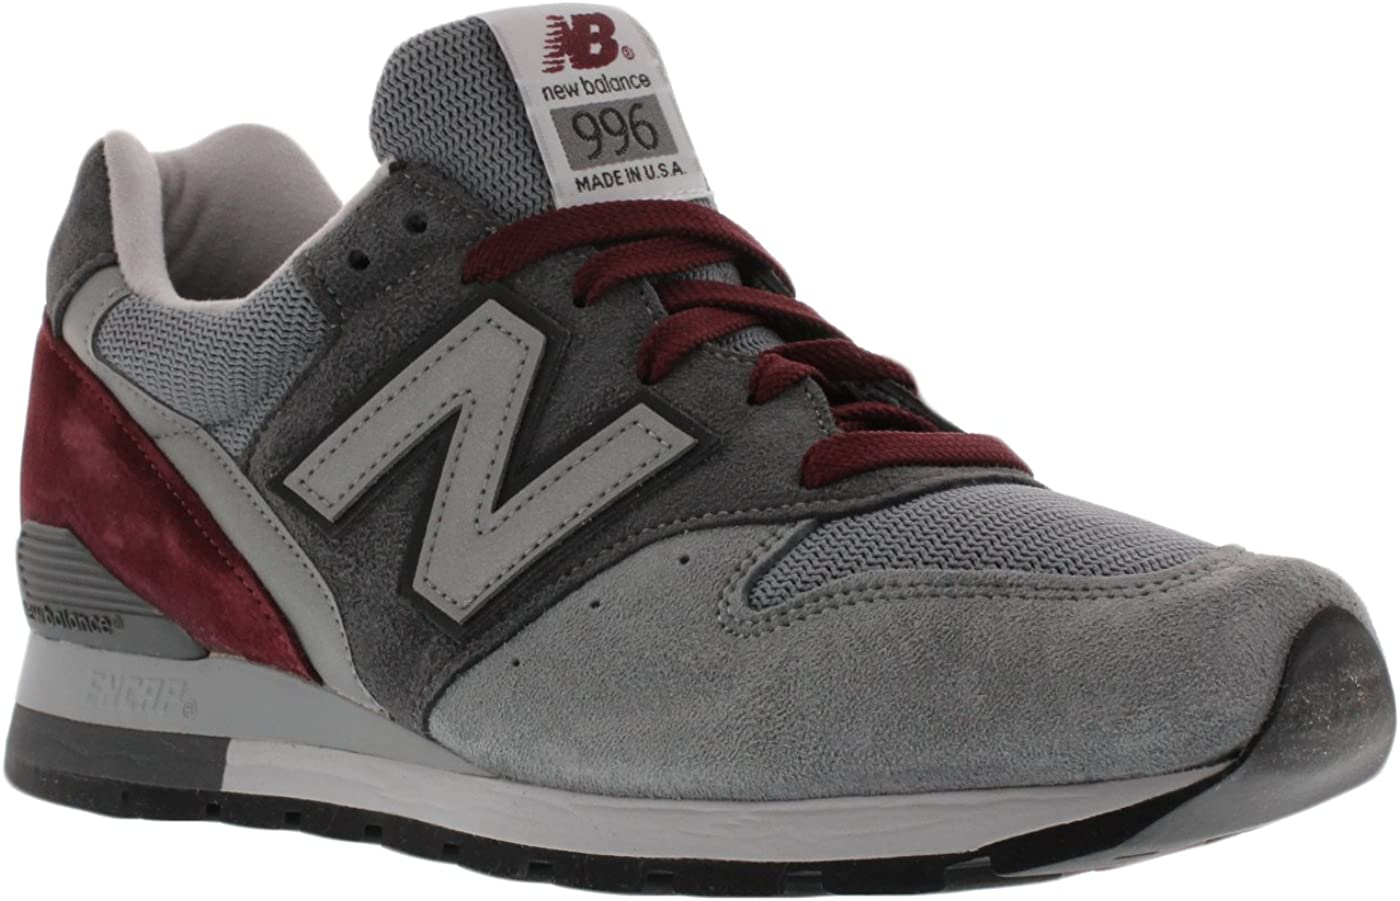 new balance 996 grey burgundy